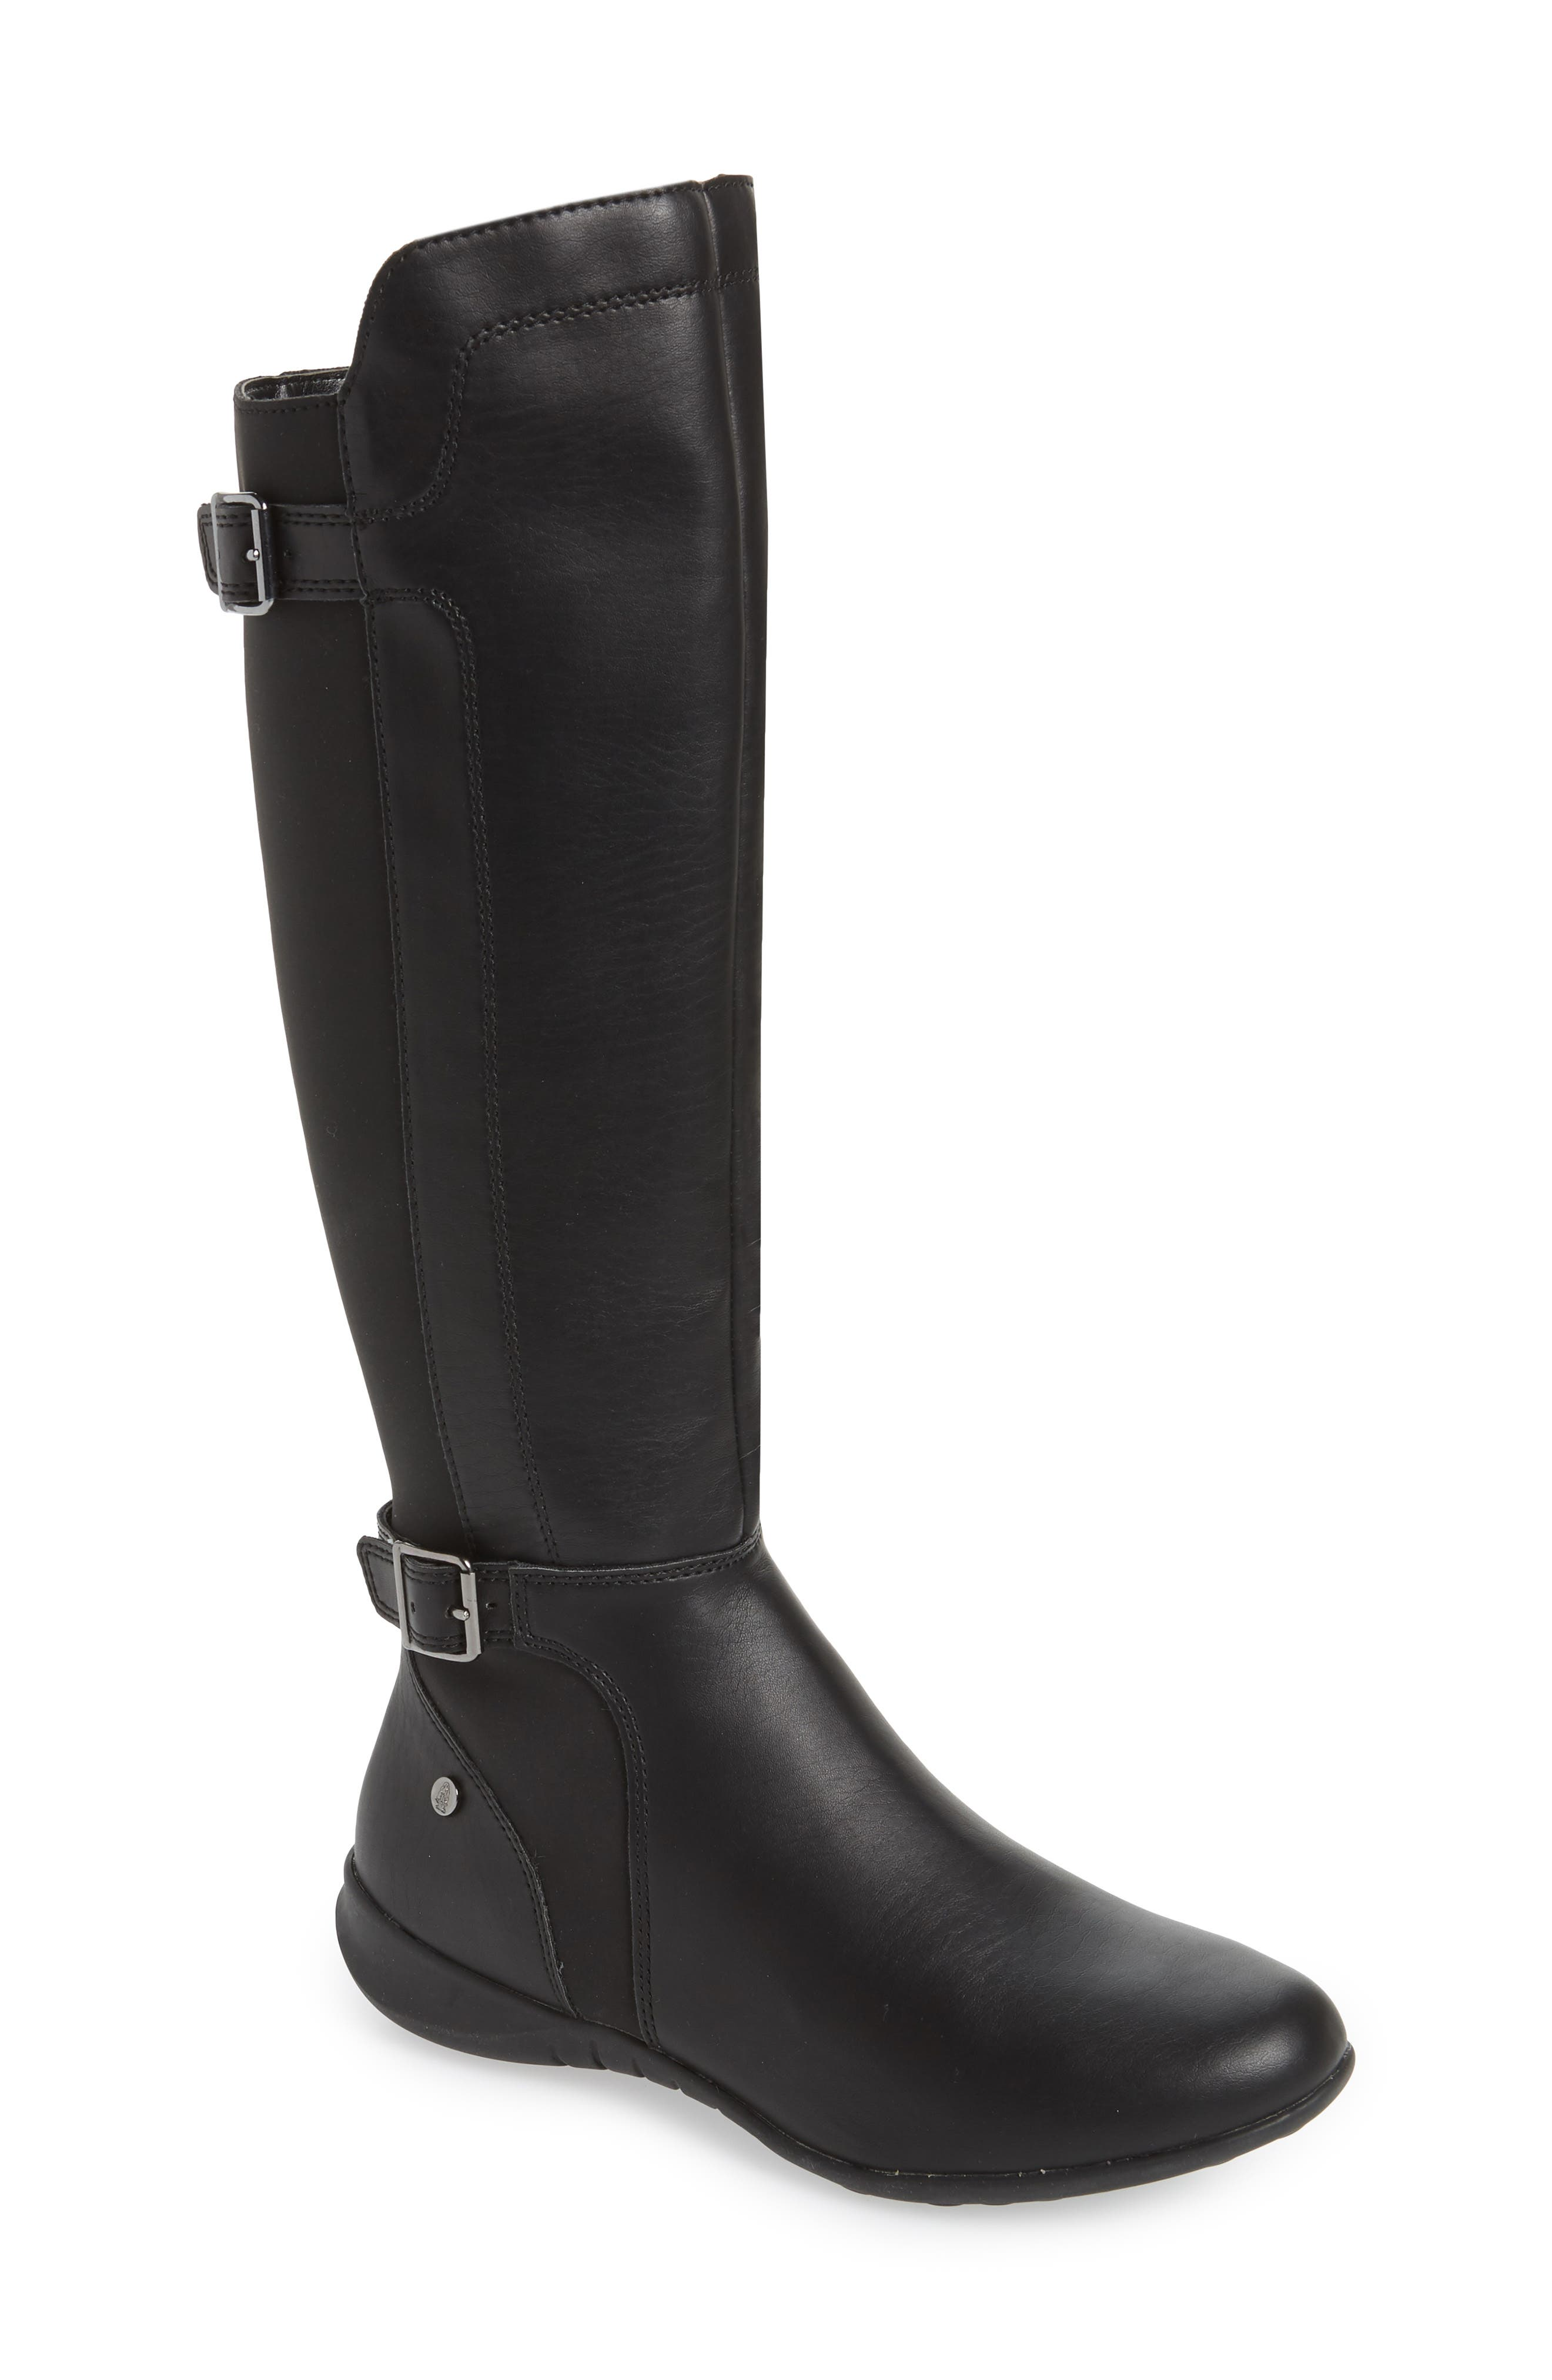 Hush Puppies Bria Knee High Boot, Black